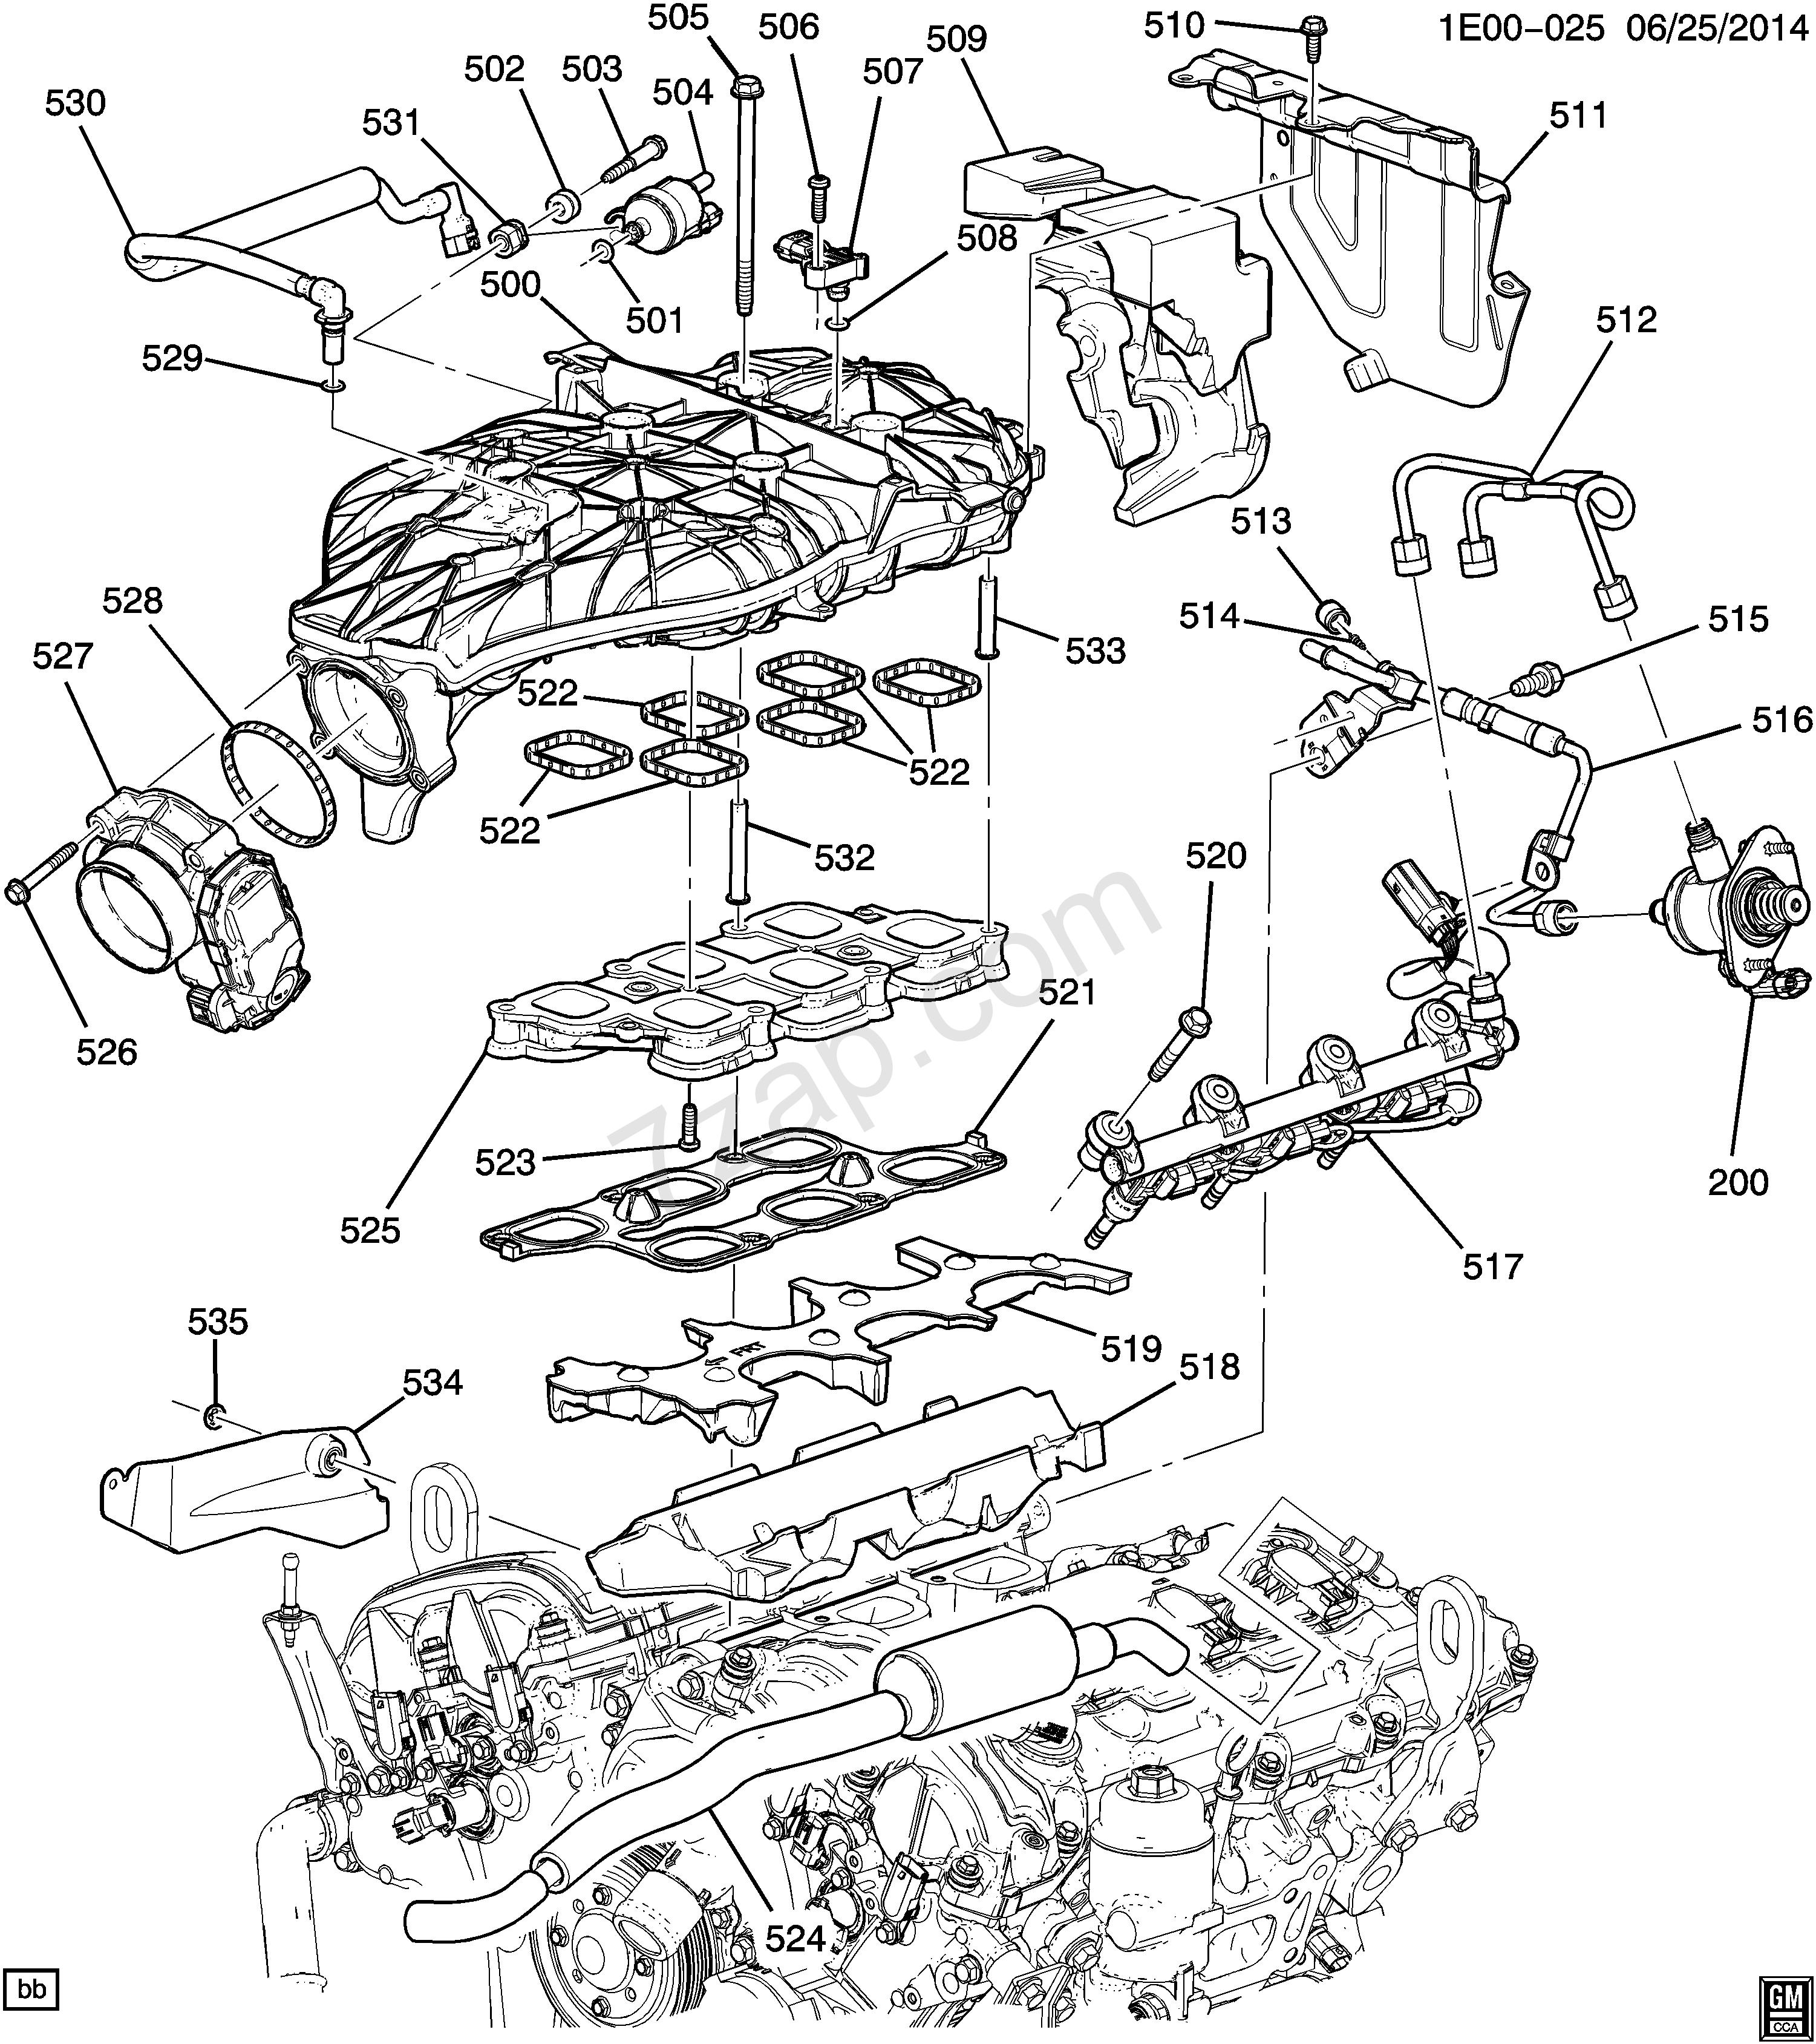 2000 Camaro Engine Diagram Wiring Diagrams Collection Collection Chatteriedelavalleedufelin Fr